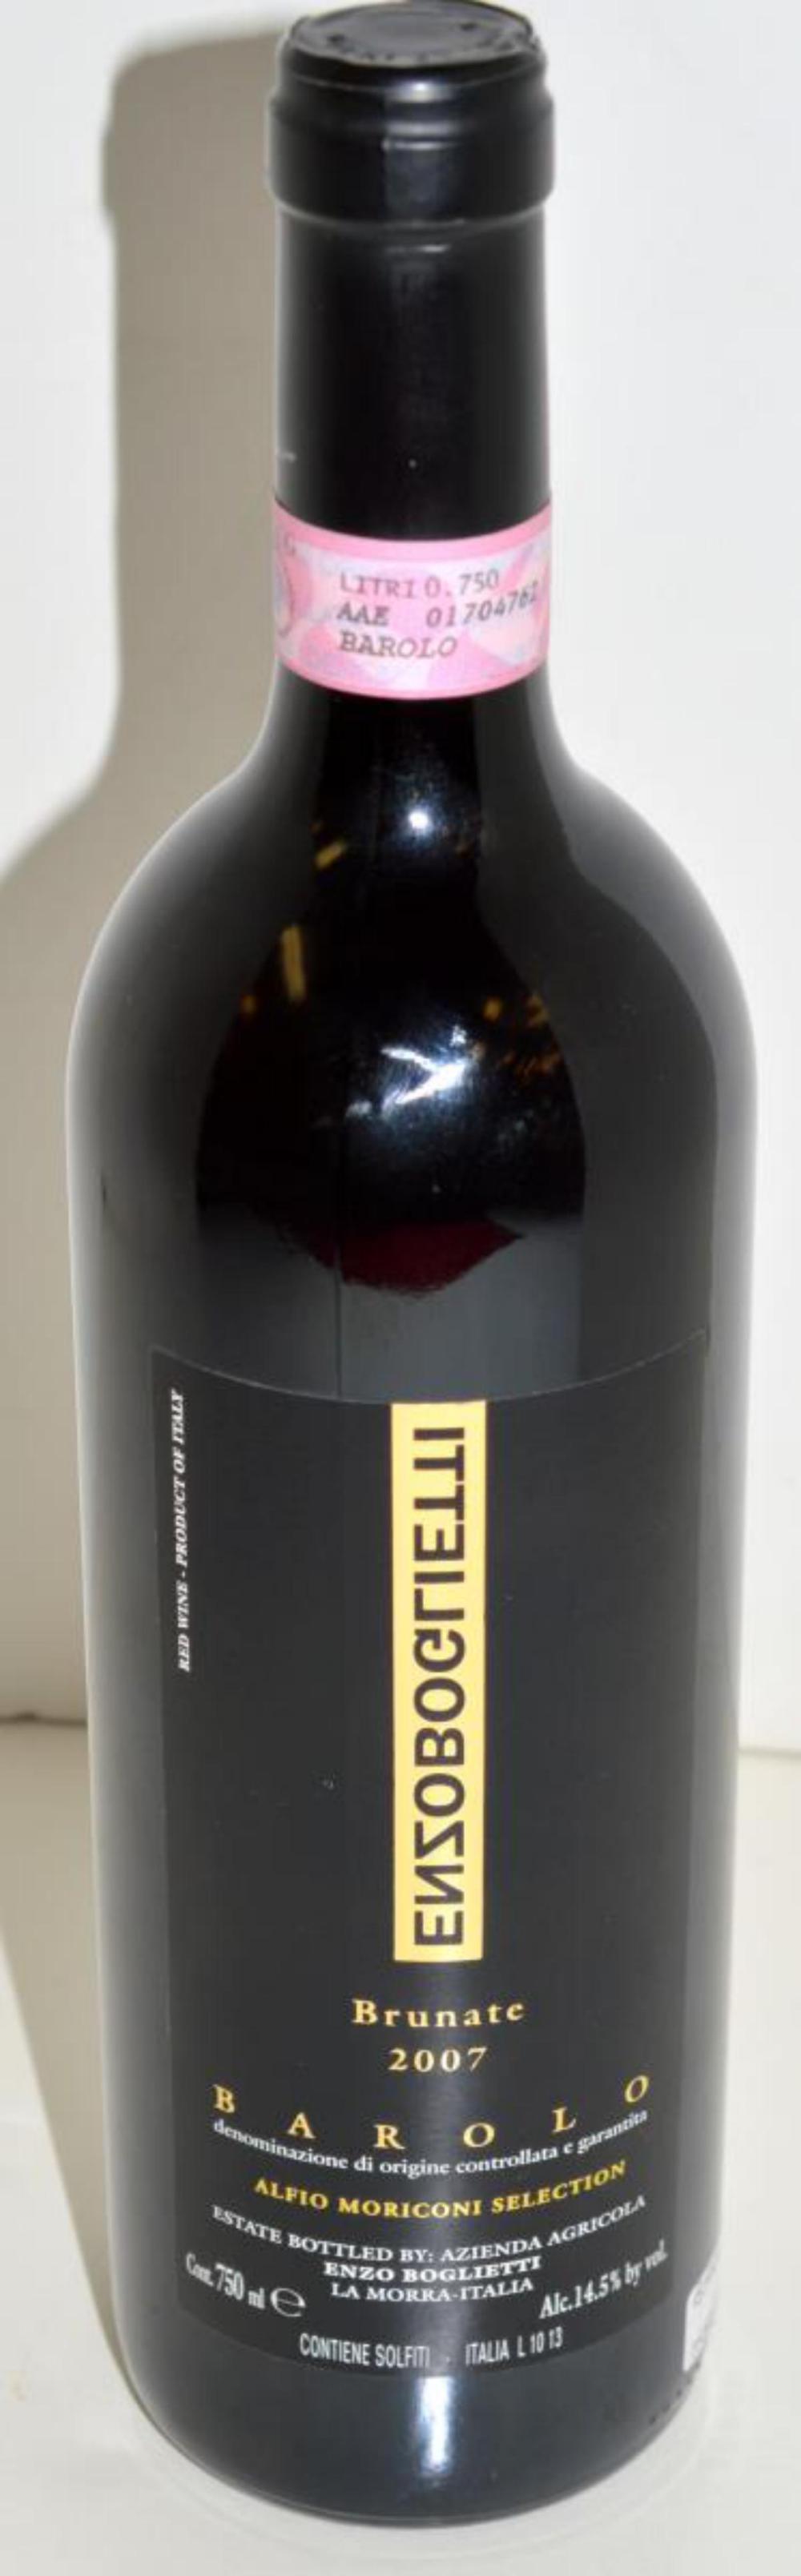 Barolo Brunate 2007 Red Wine Handmade from Italy